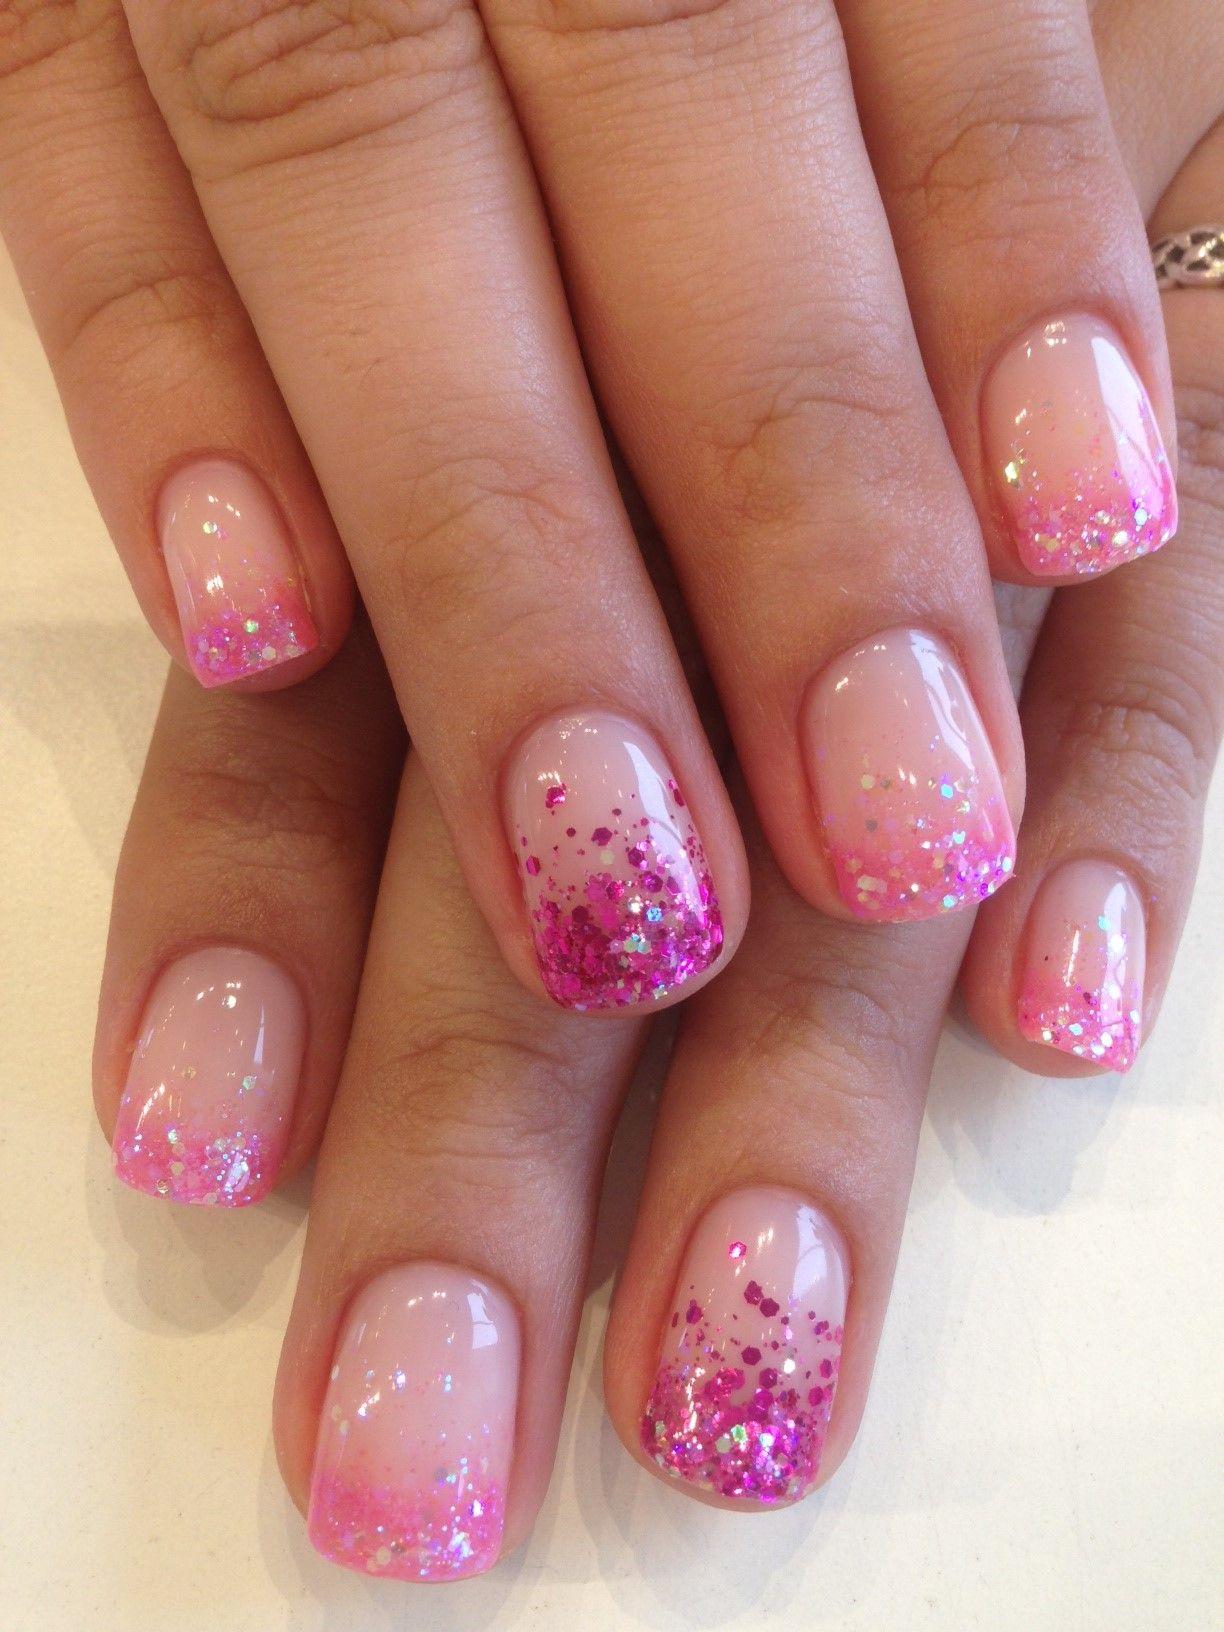 Pink glitter French tips | Nails | Pinterest | Pink glitter ...